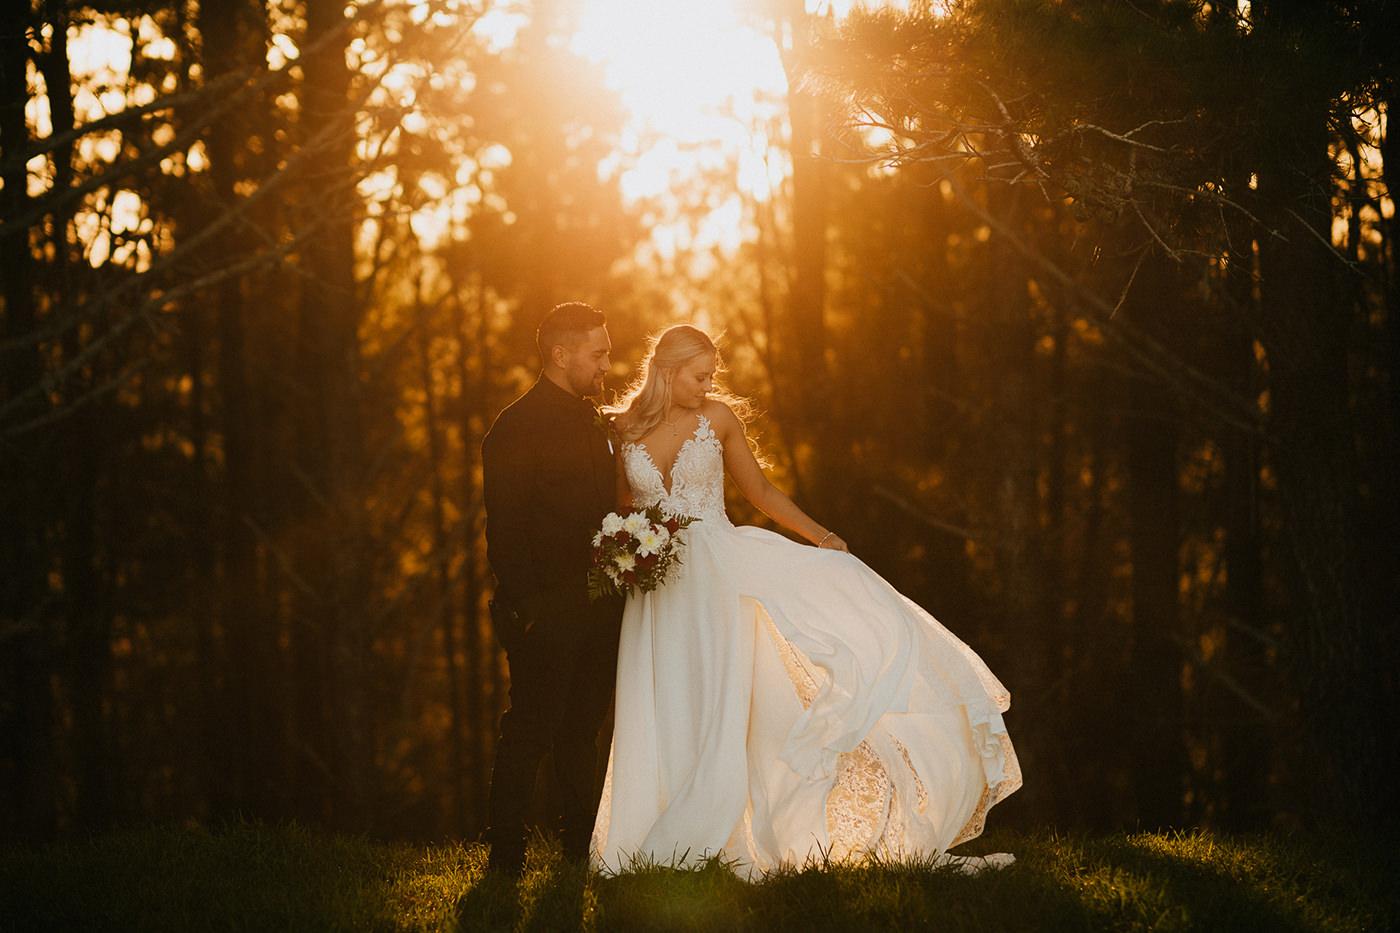 wedding_photographer_nz-00001